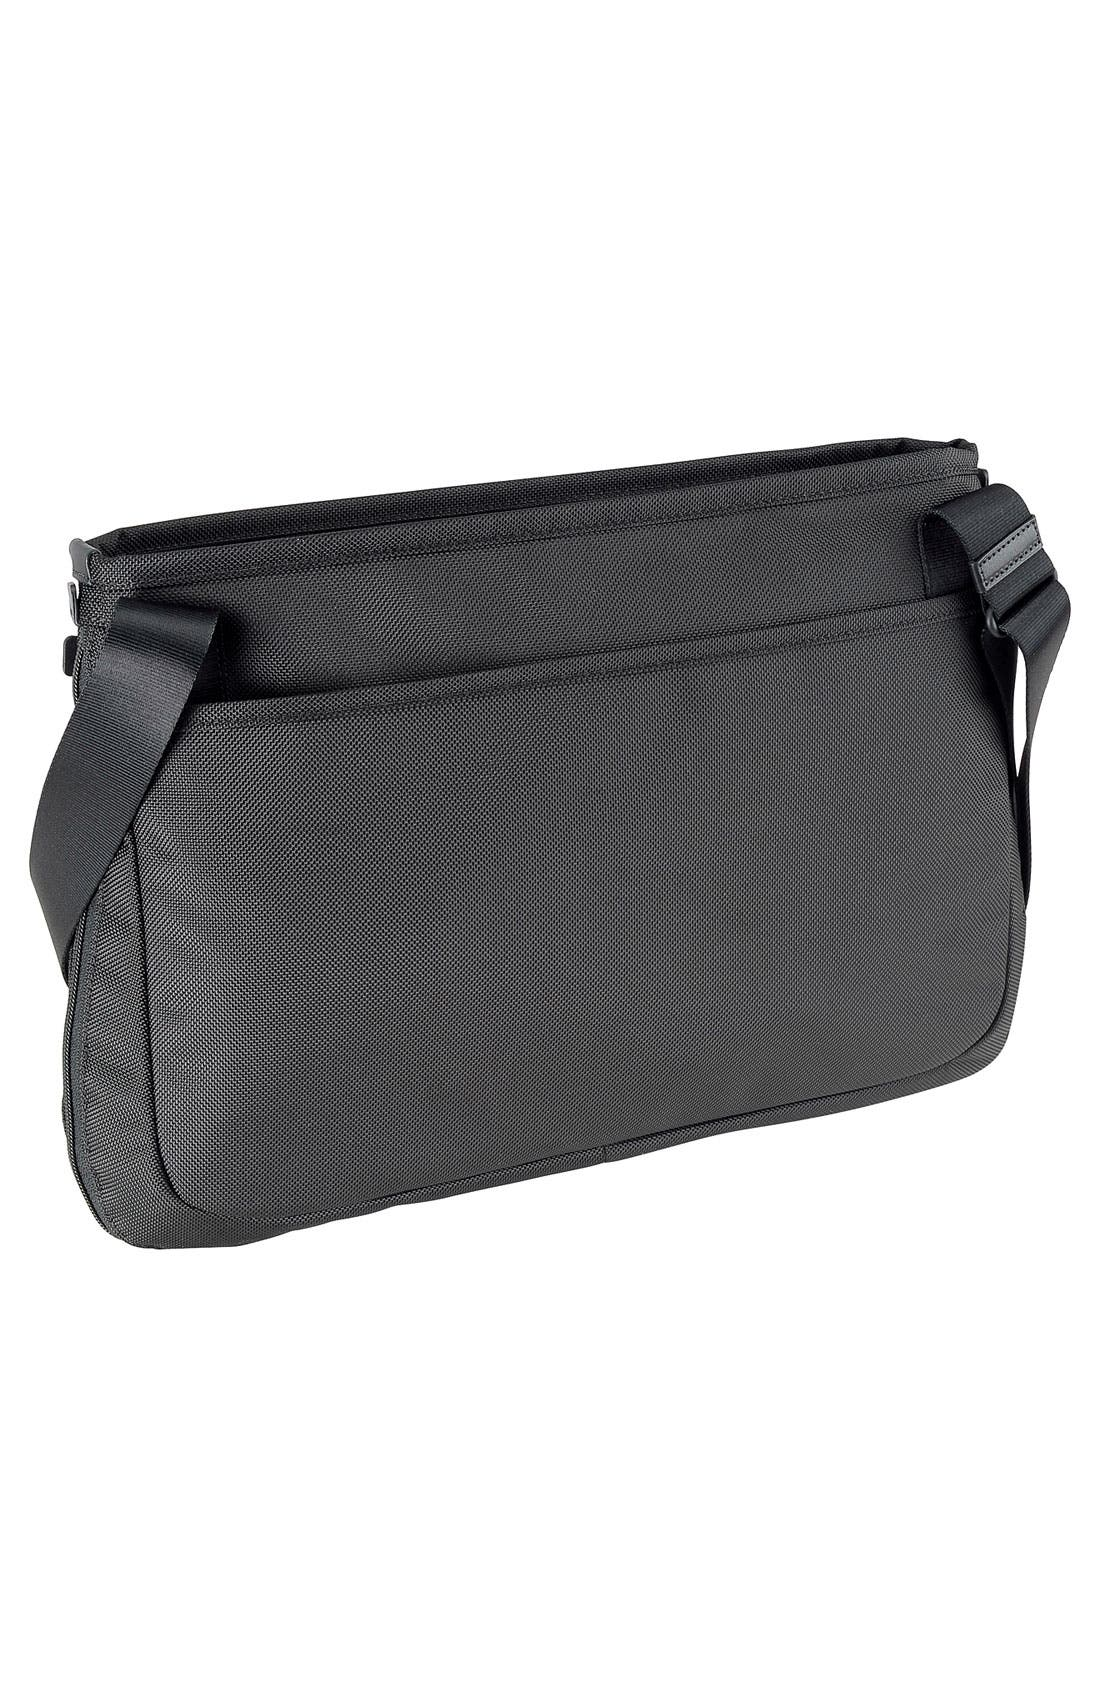 Alternate Image 2  - Tumi 'Alpha' Slim Messenger Bag